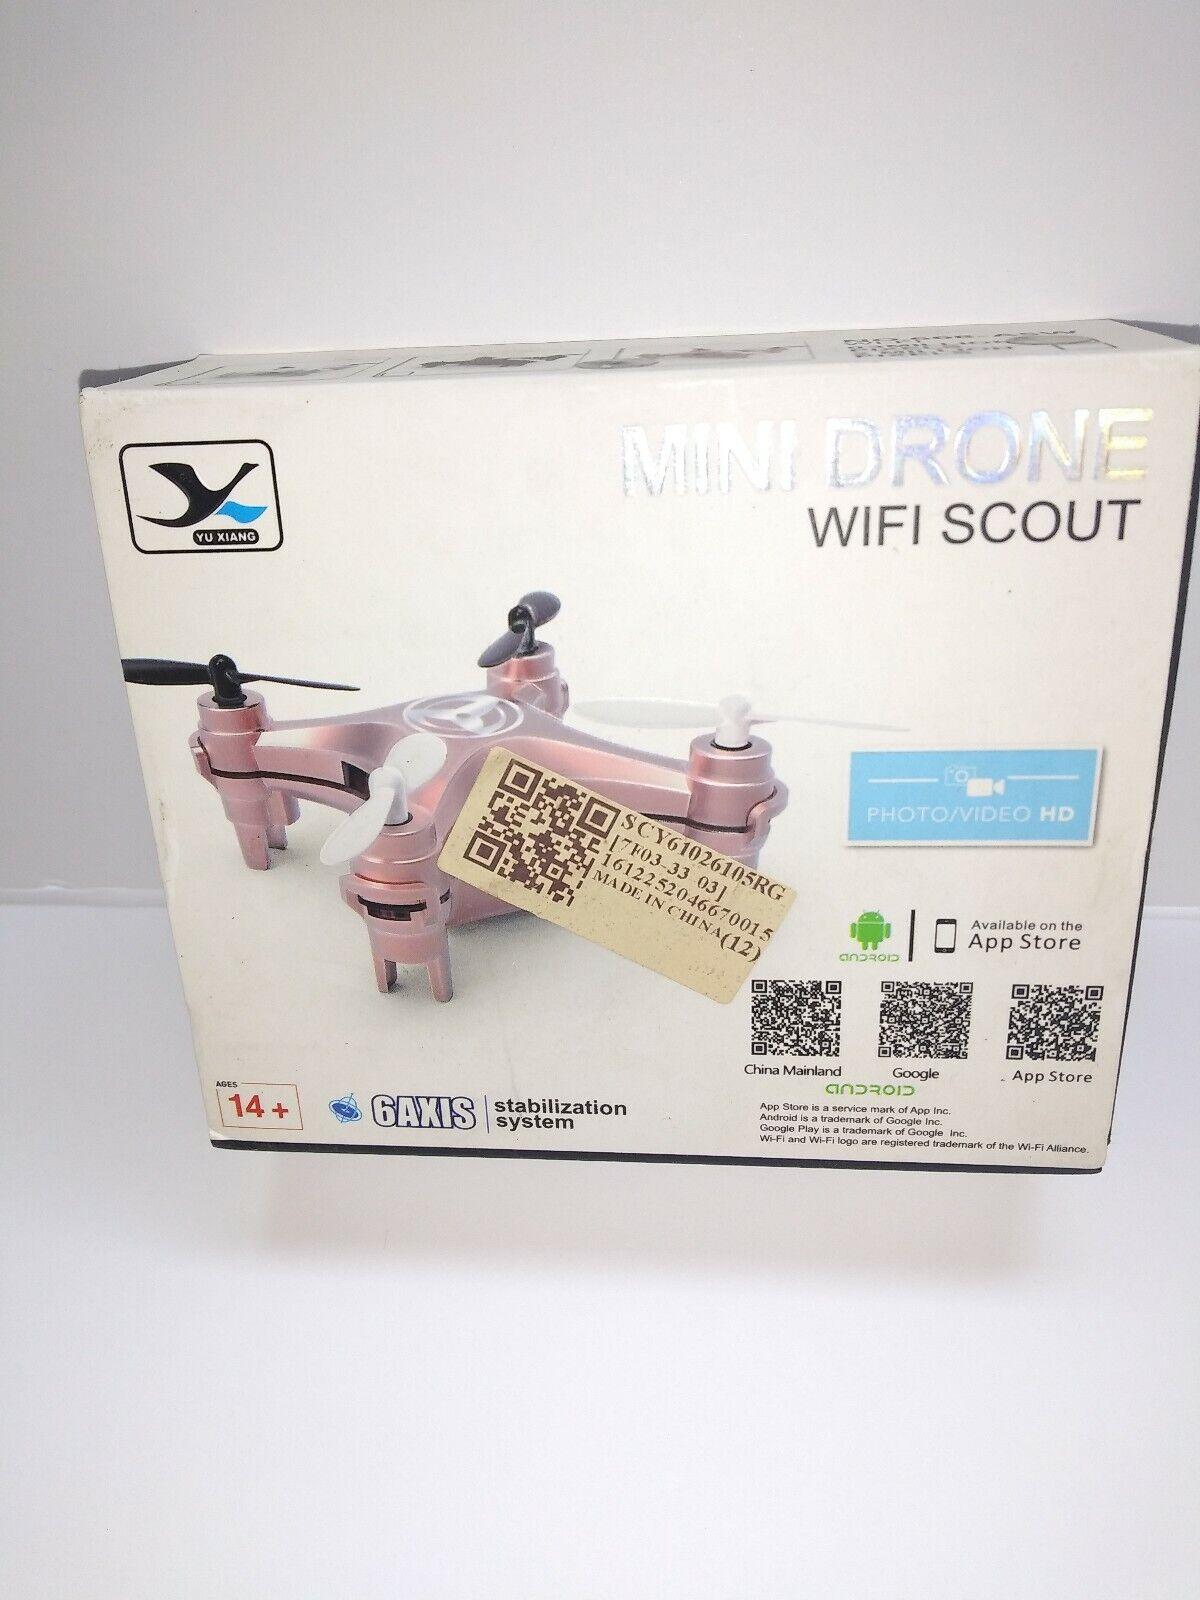 Syma X5sw FPV Explorers2 2 4ghz 4ch 6-axis Gyro RC Quadcopter Drone